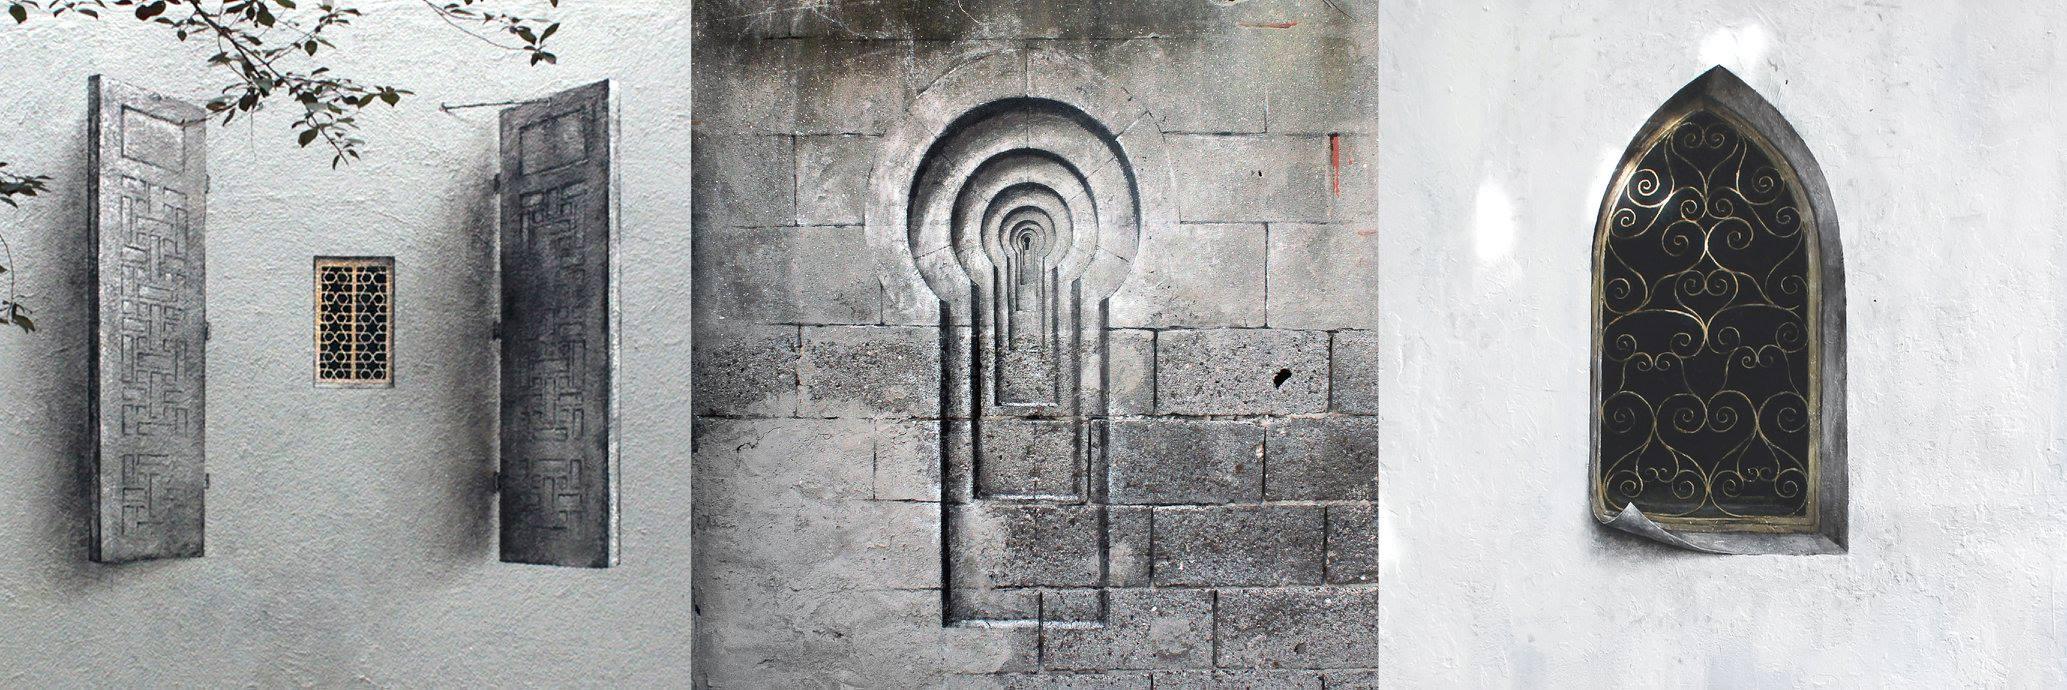 Creative-street-art-pejac-5